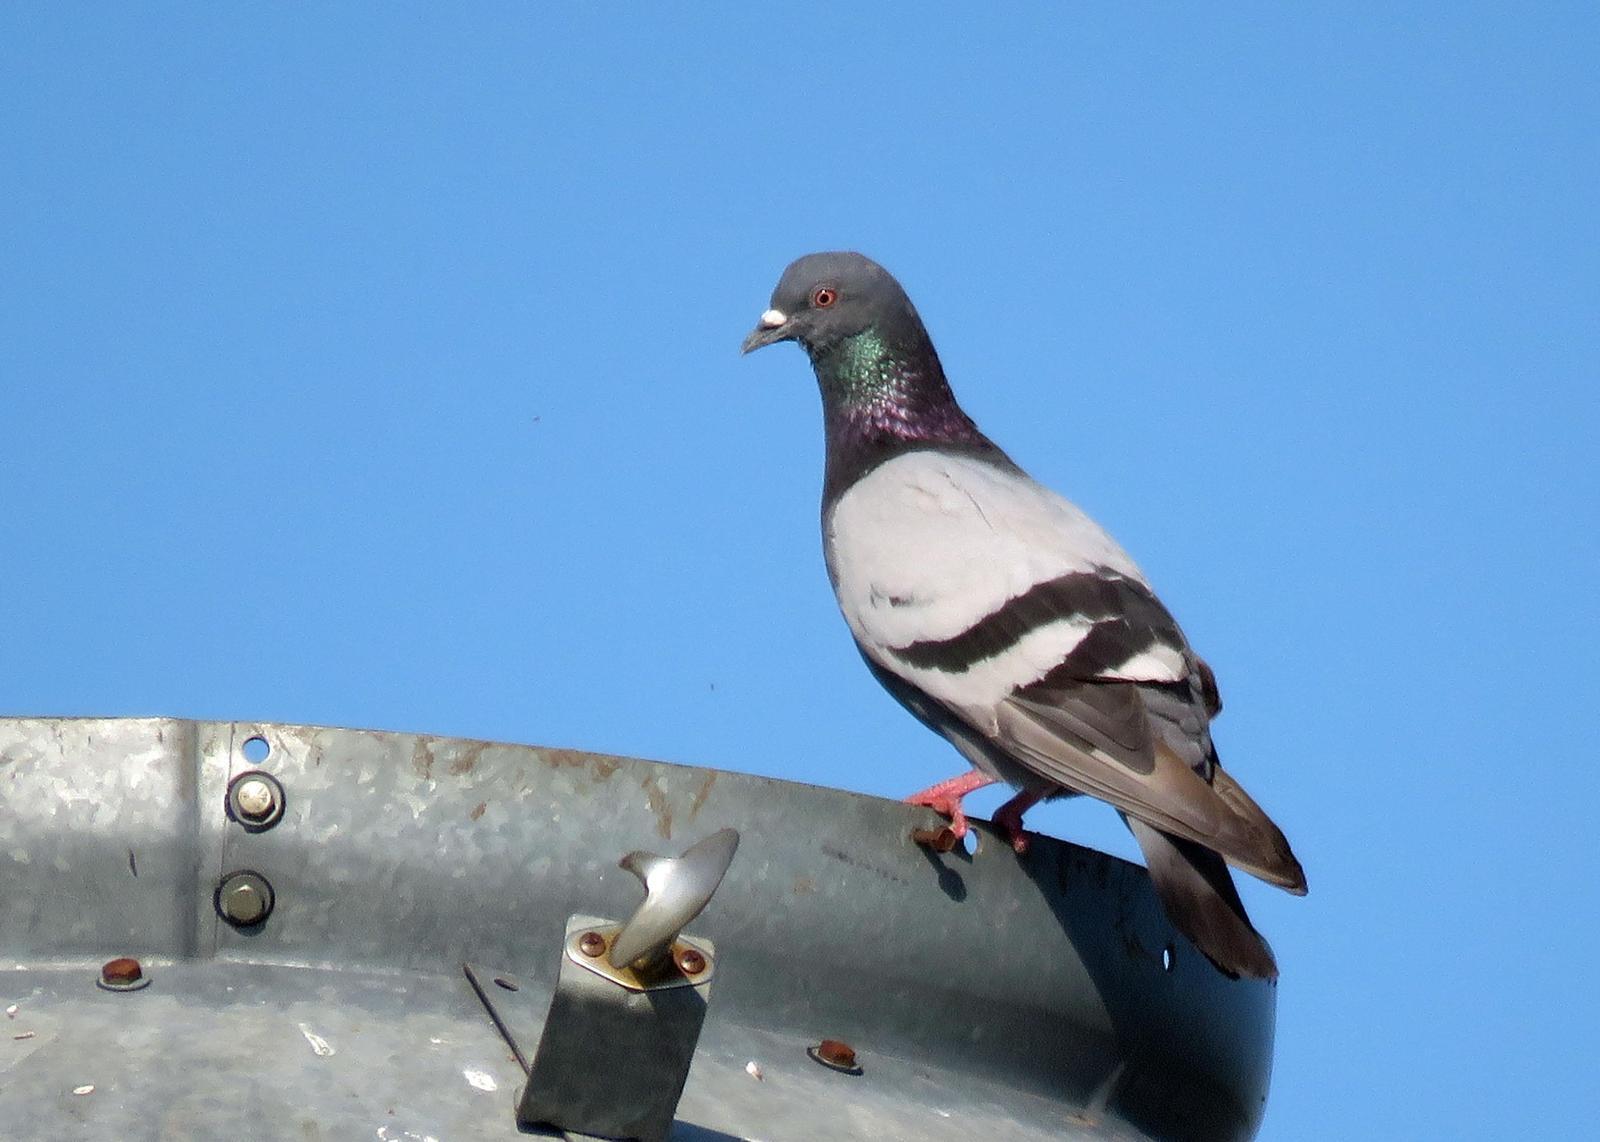 Rock Pigeon Photo by Kelly Preheim